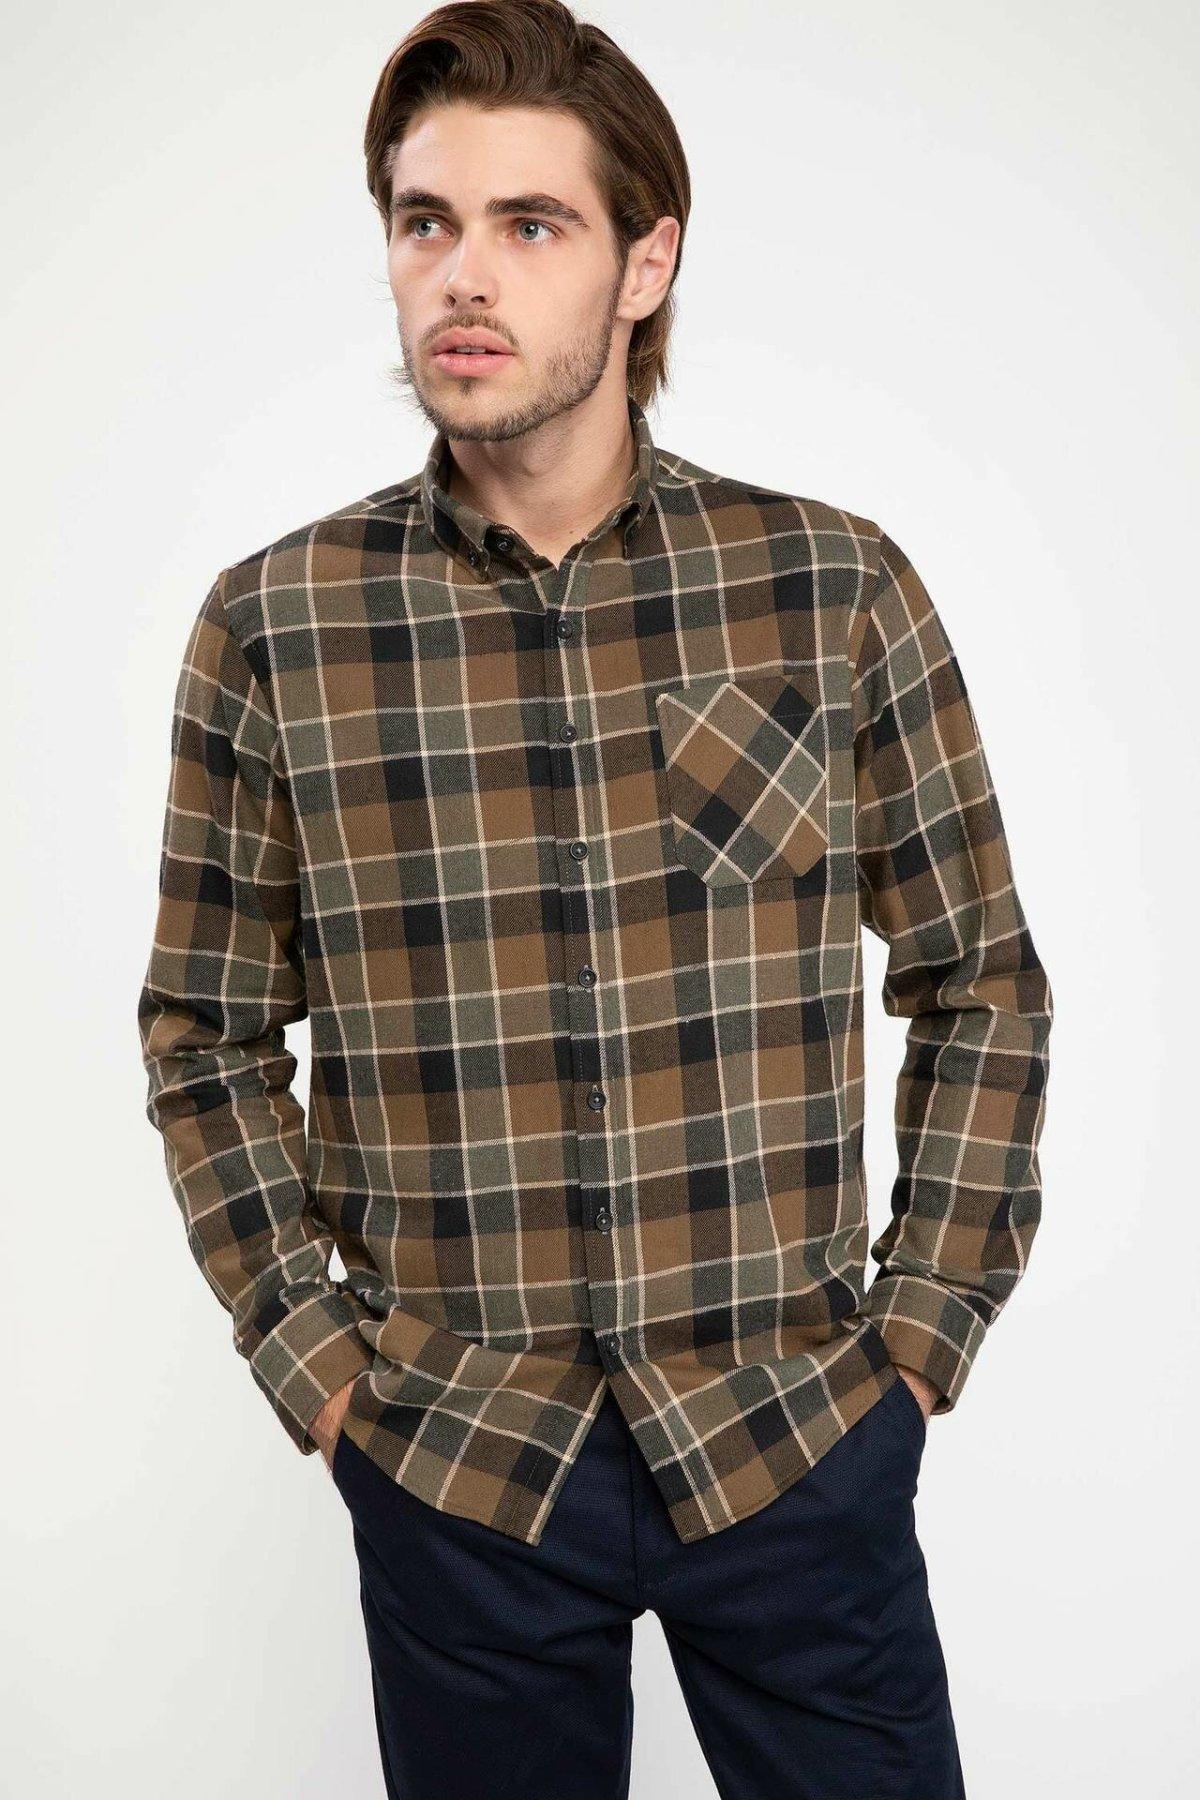 DeFacto New Man Fashion Long Sleeve Shirt Male Casual Plaid Loose Shirts Men's Comfort Tops High Quality Autumn  - J4175AZ18WN